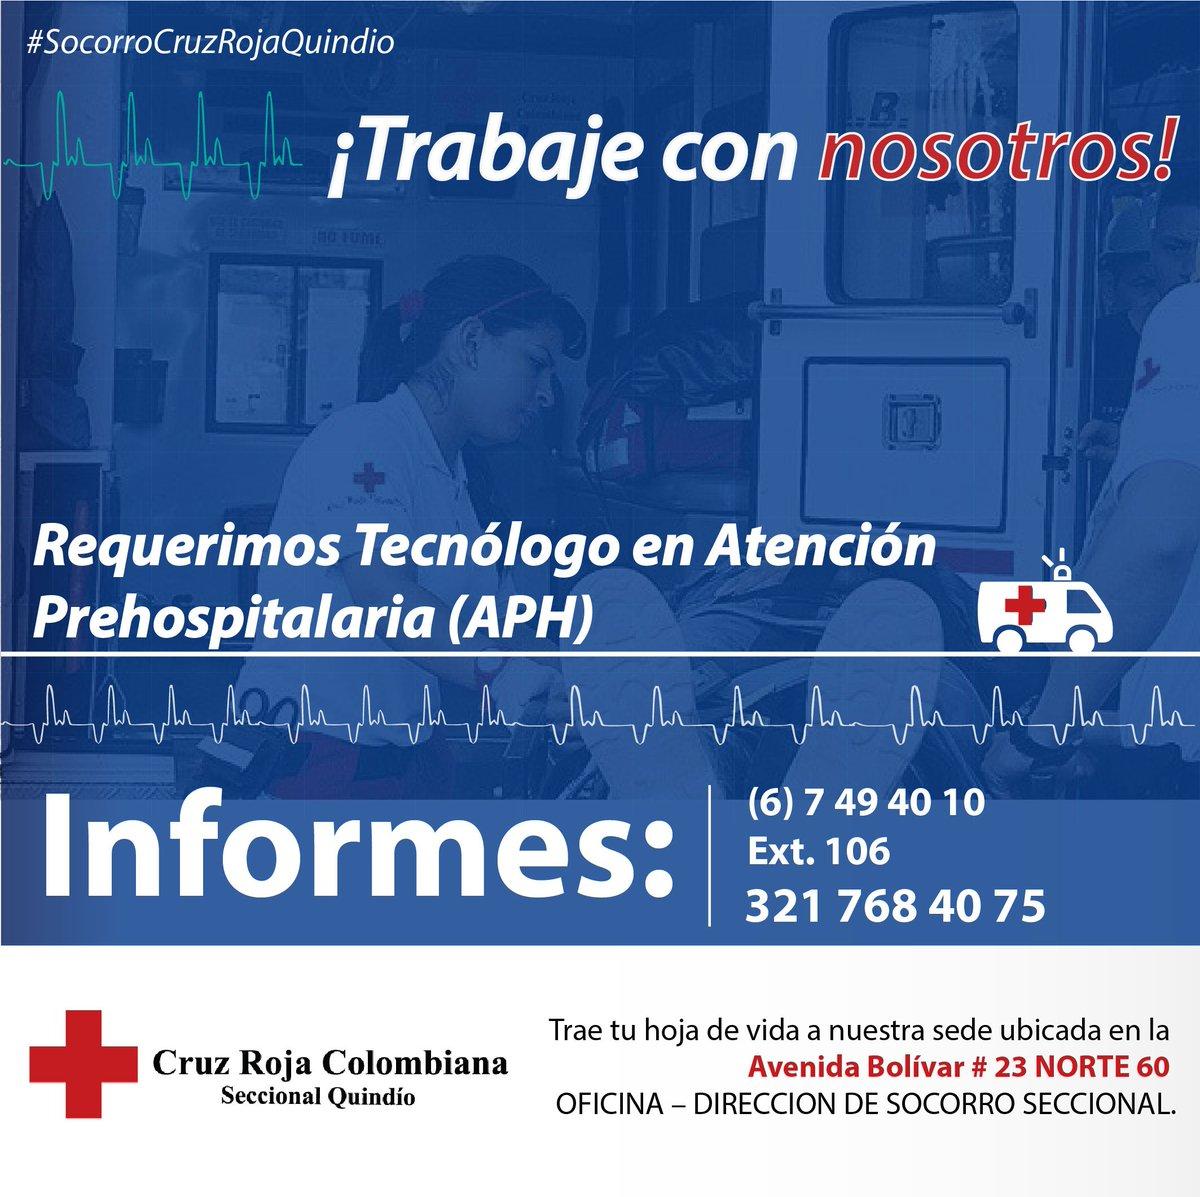 ¡Trabaje con nosotros! #SiHayTrabajo  #SocorroCruzRojaQuindio<br>http://pic.twitter.com/QKglwvMdMF